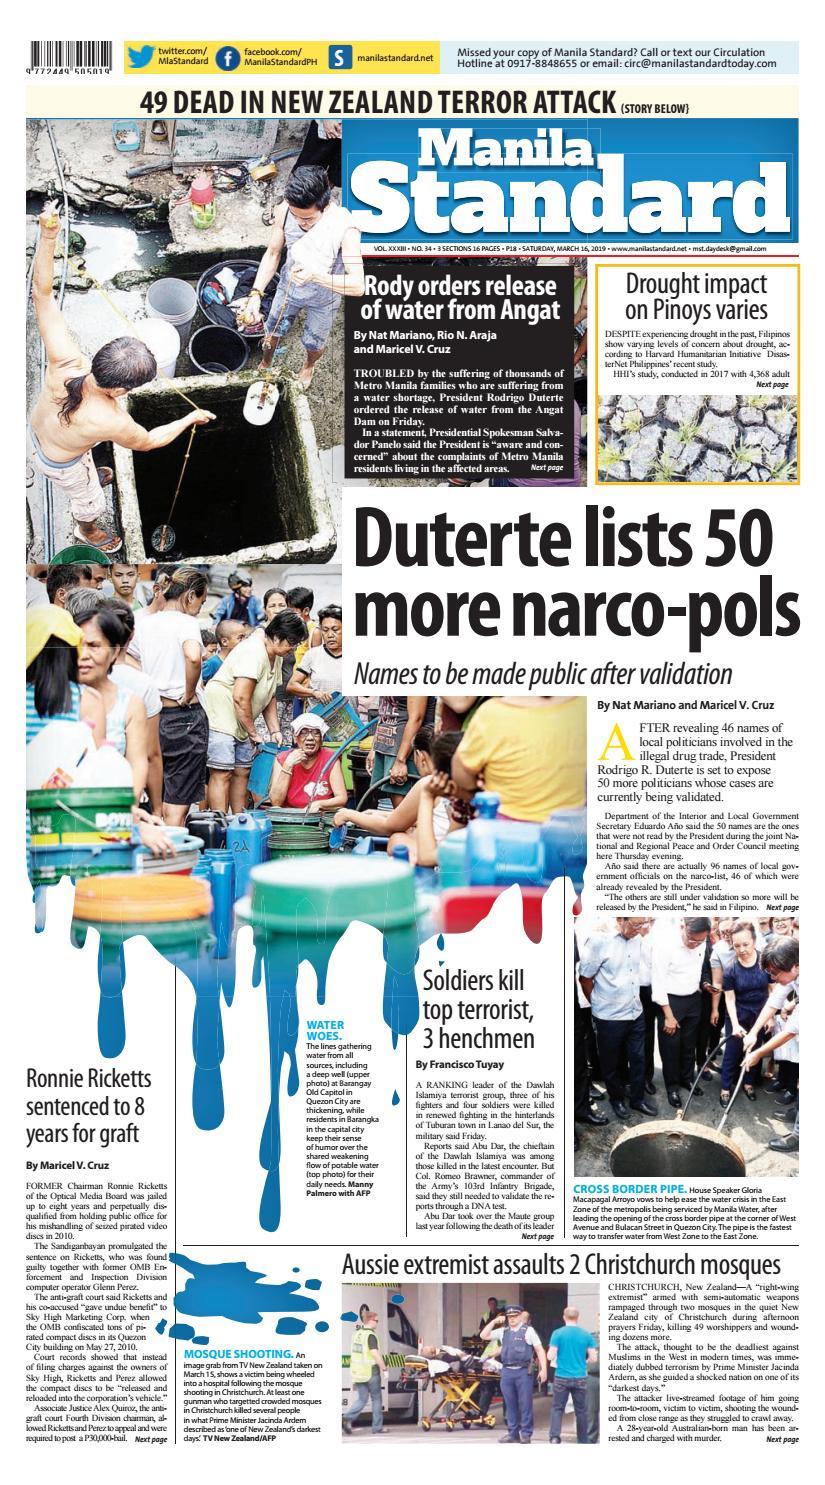 Manila Standard - 2019 March 16 - Saturday by Manila Standard - issuu